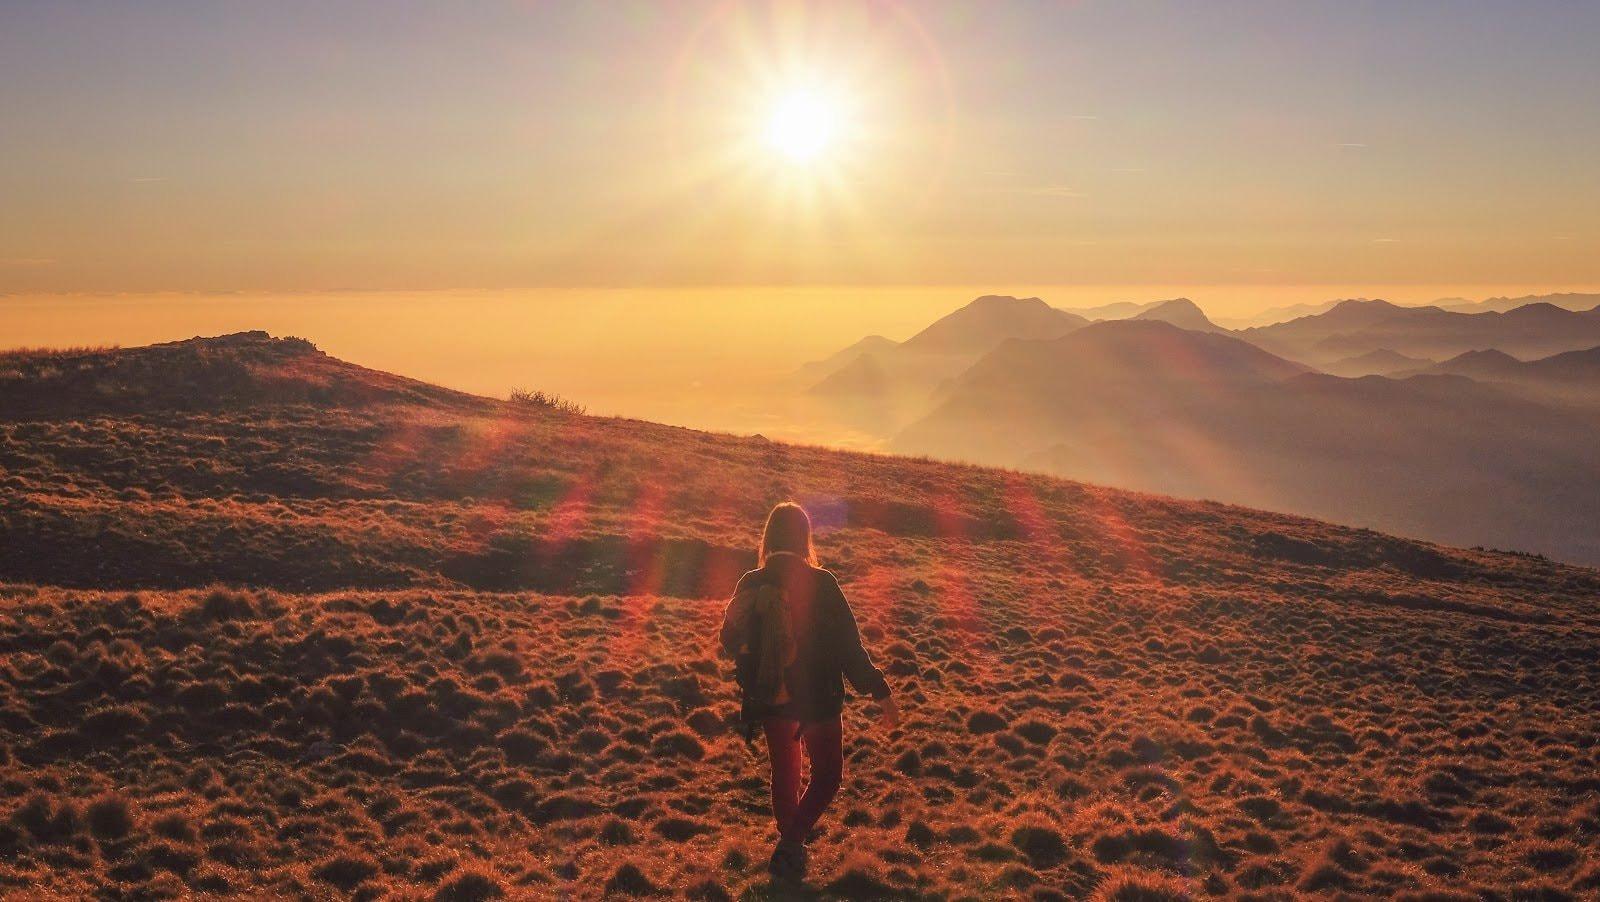 Golden hour photo of a woman walking through a field by Cristina Gottardi